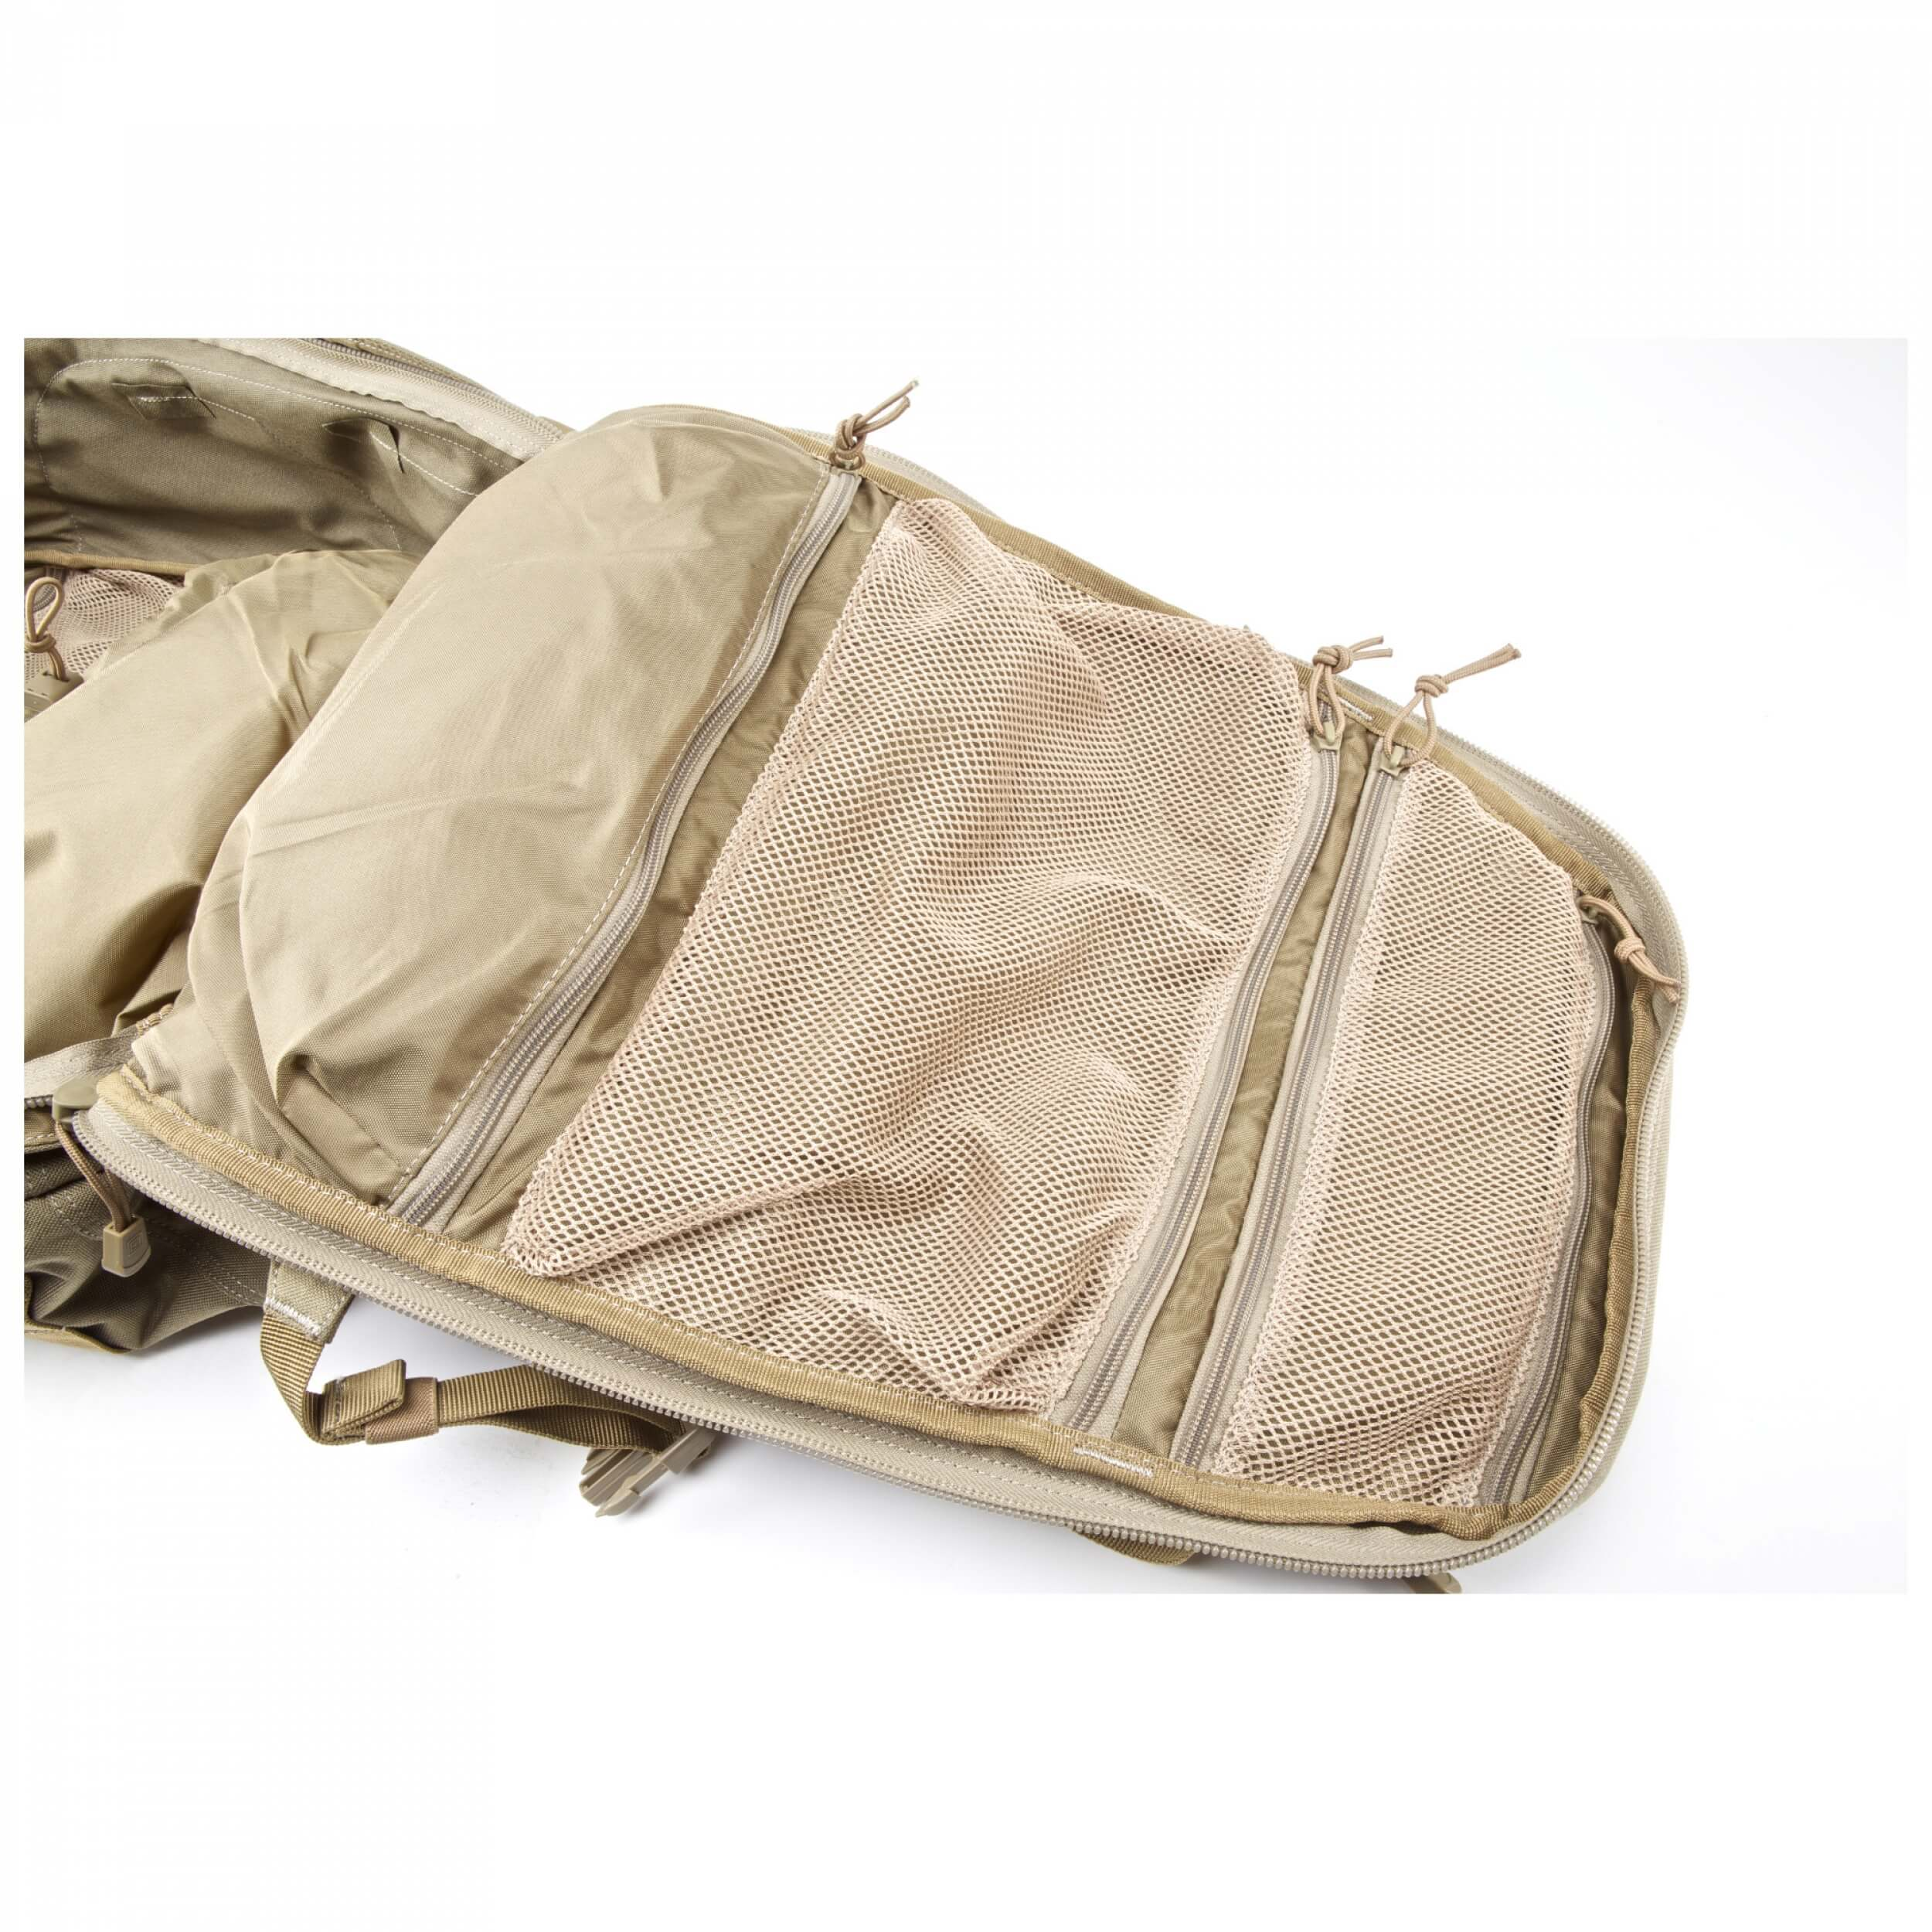 5.11 Tactical Rush 72 Backpack Flat Dark Earth